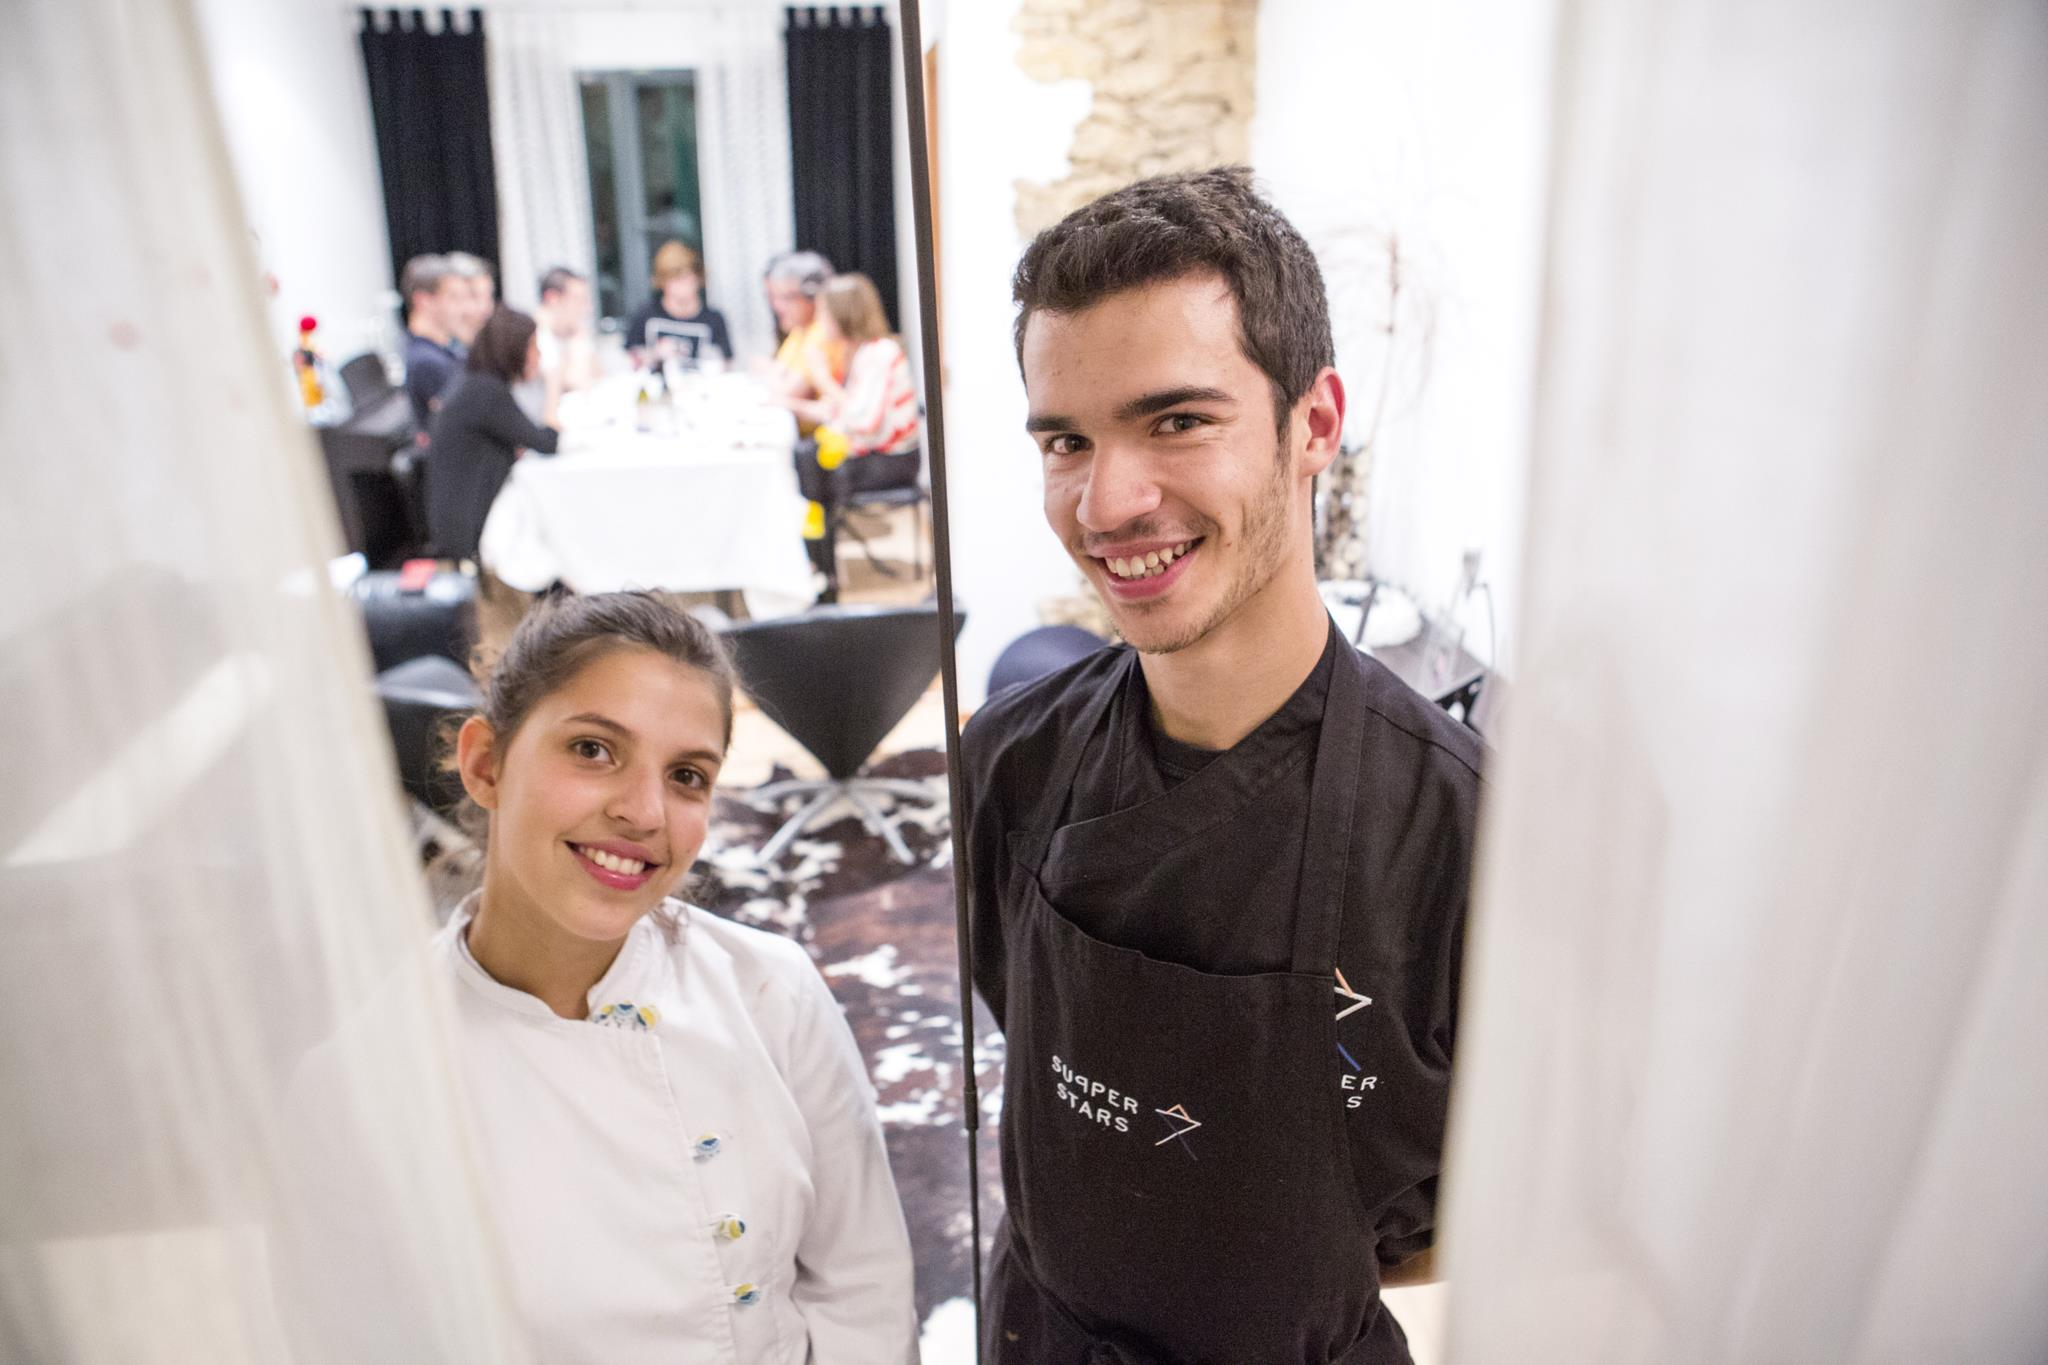 Vasco e Matilde, o cozinheiro e a pasteleira, 21 e 20 anos, de respectivamente